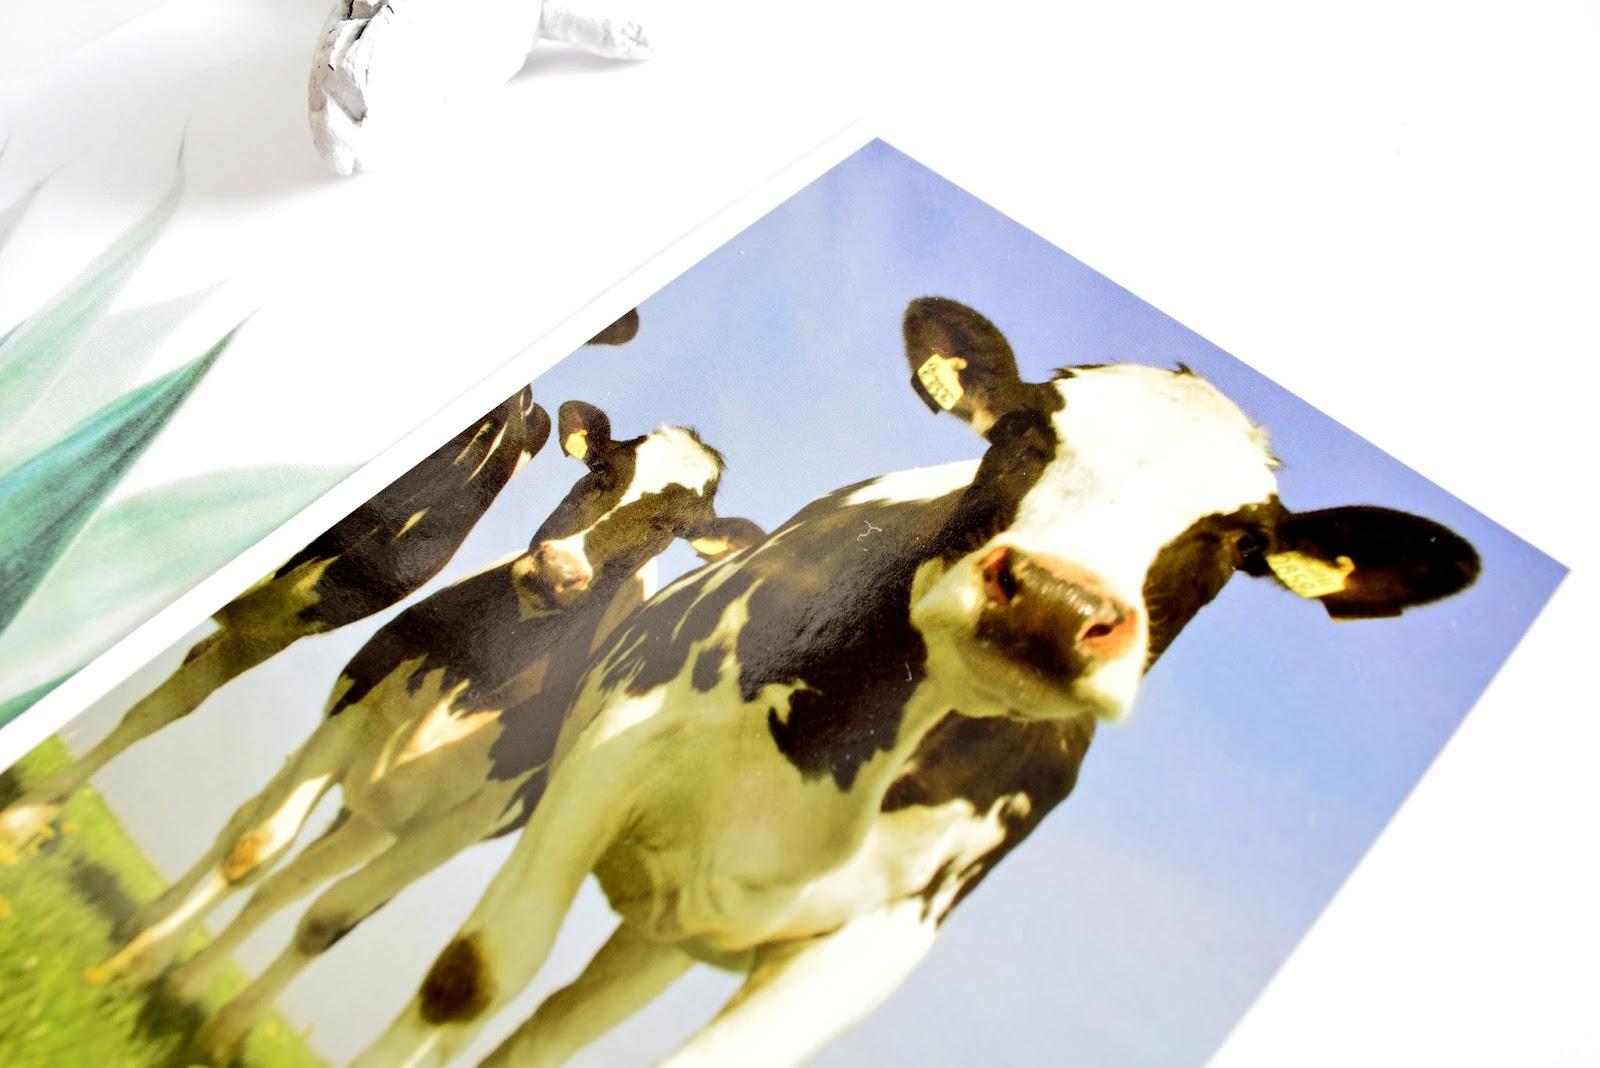 krowa jako symbol holandii